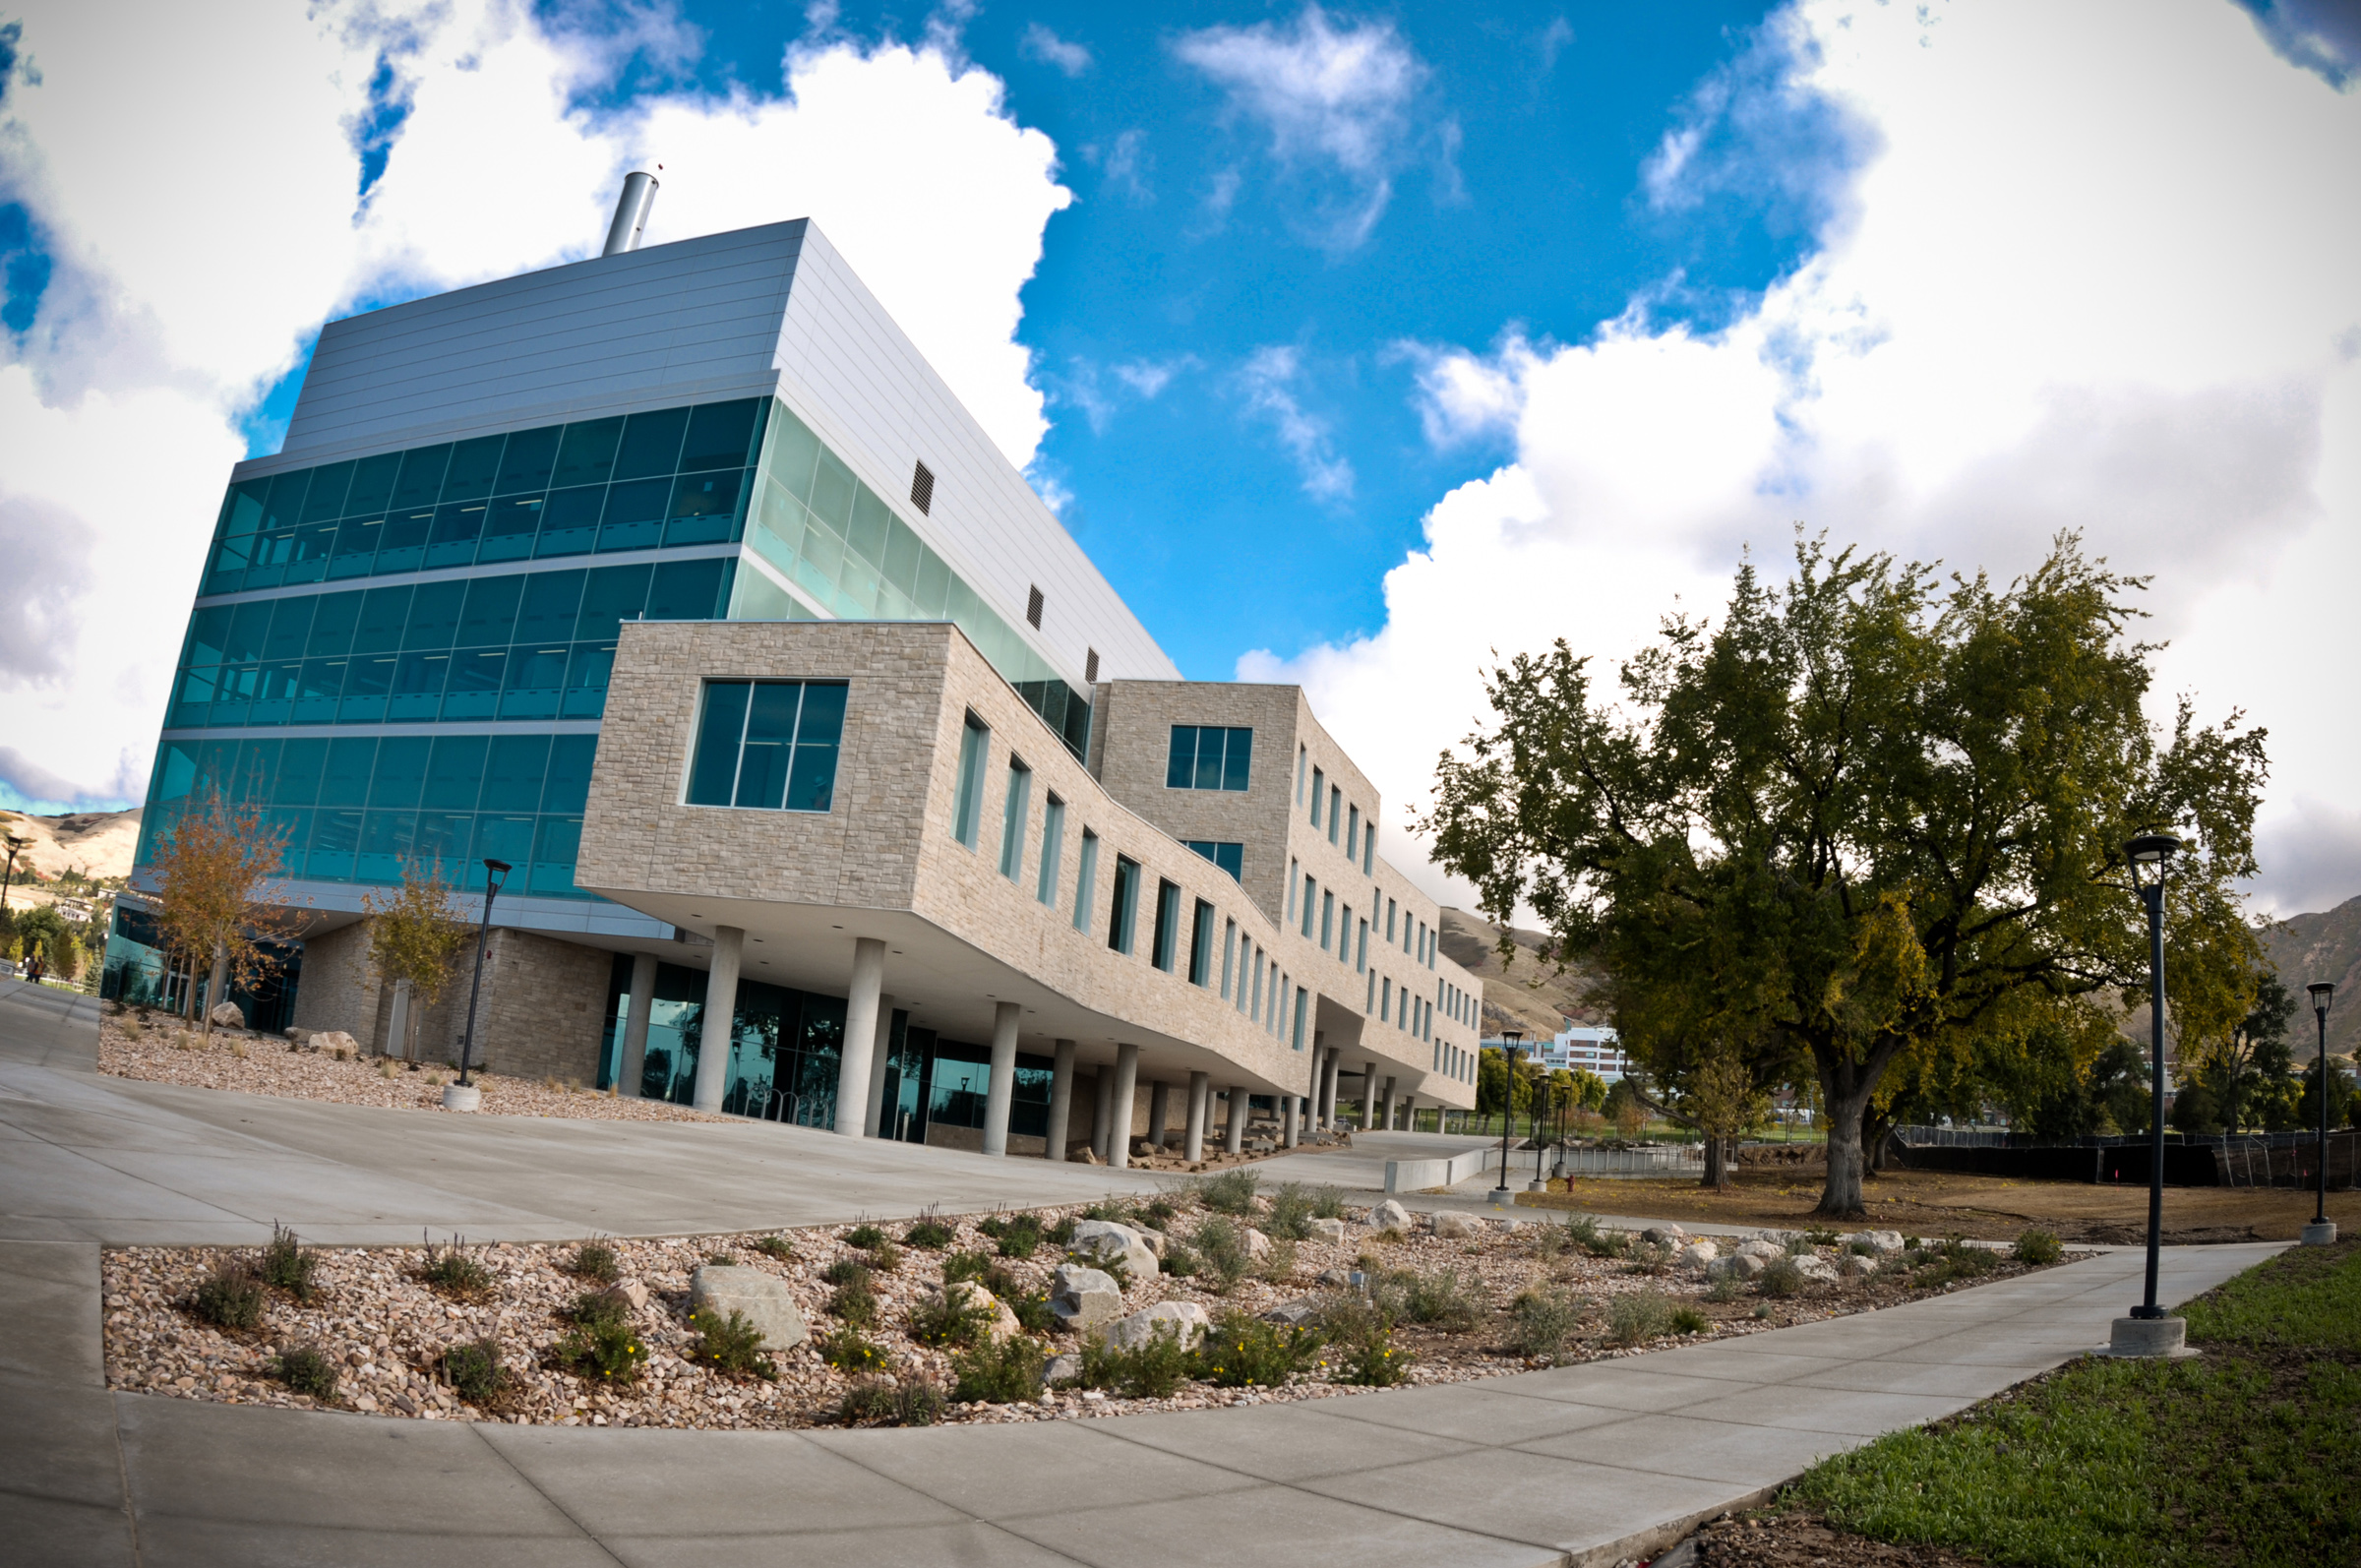 New USTAR building at the University of Utah